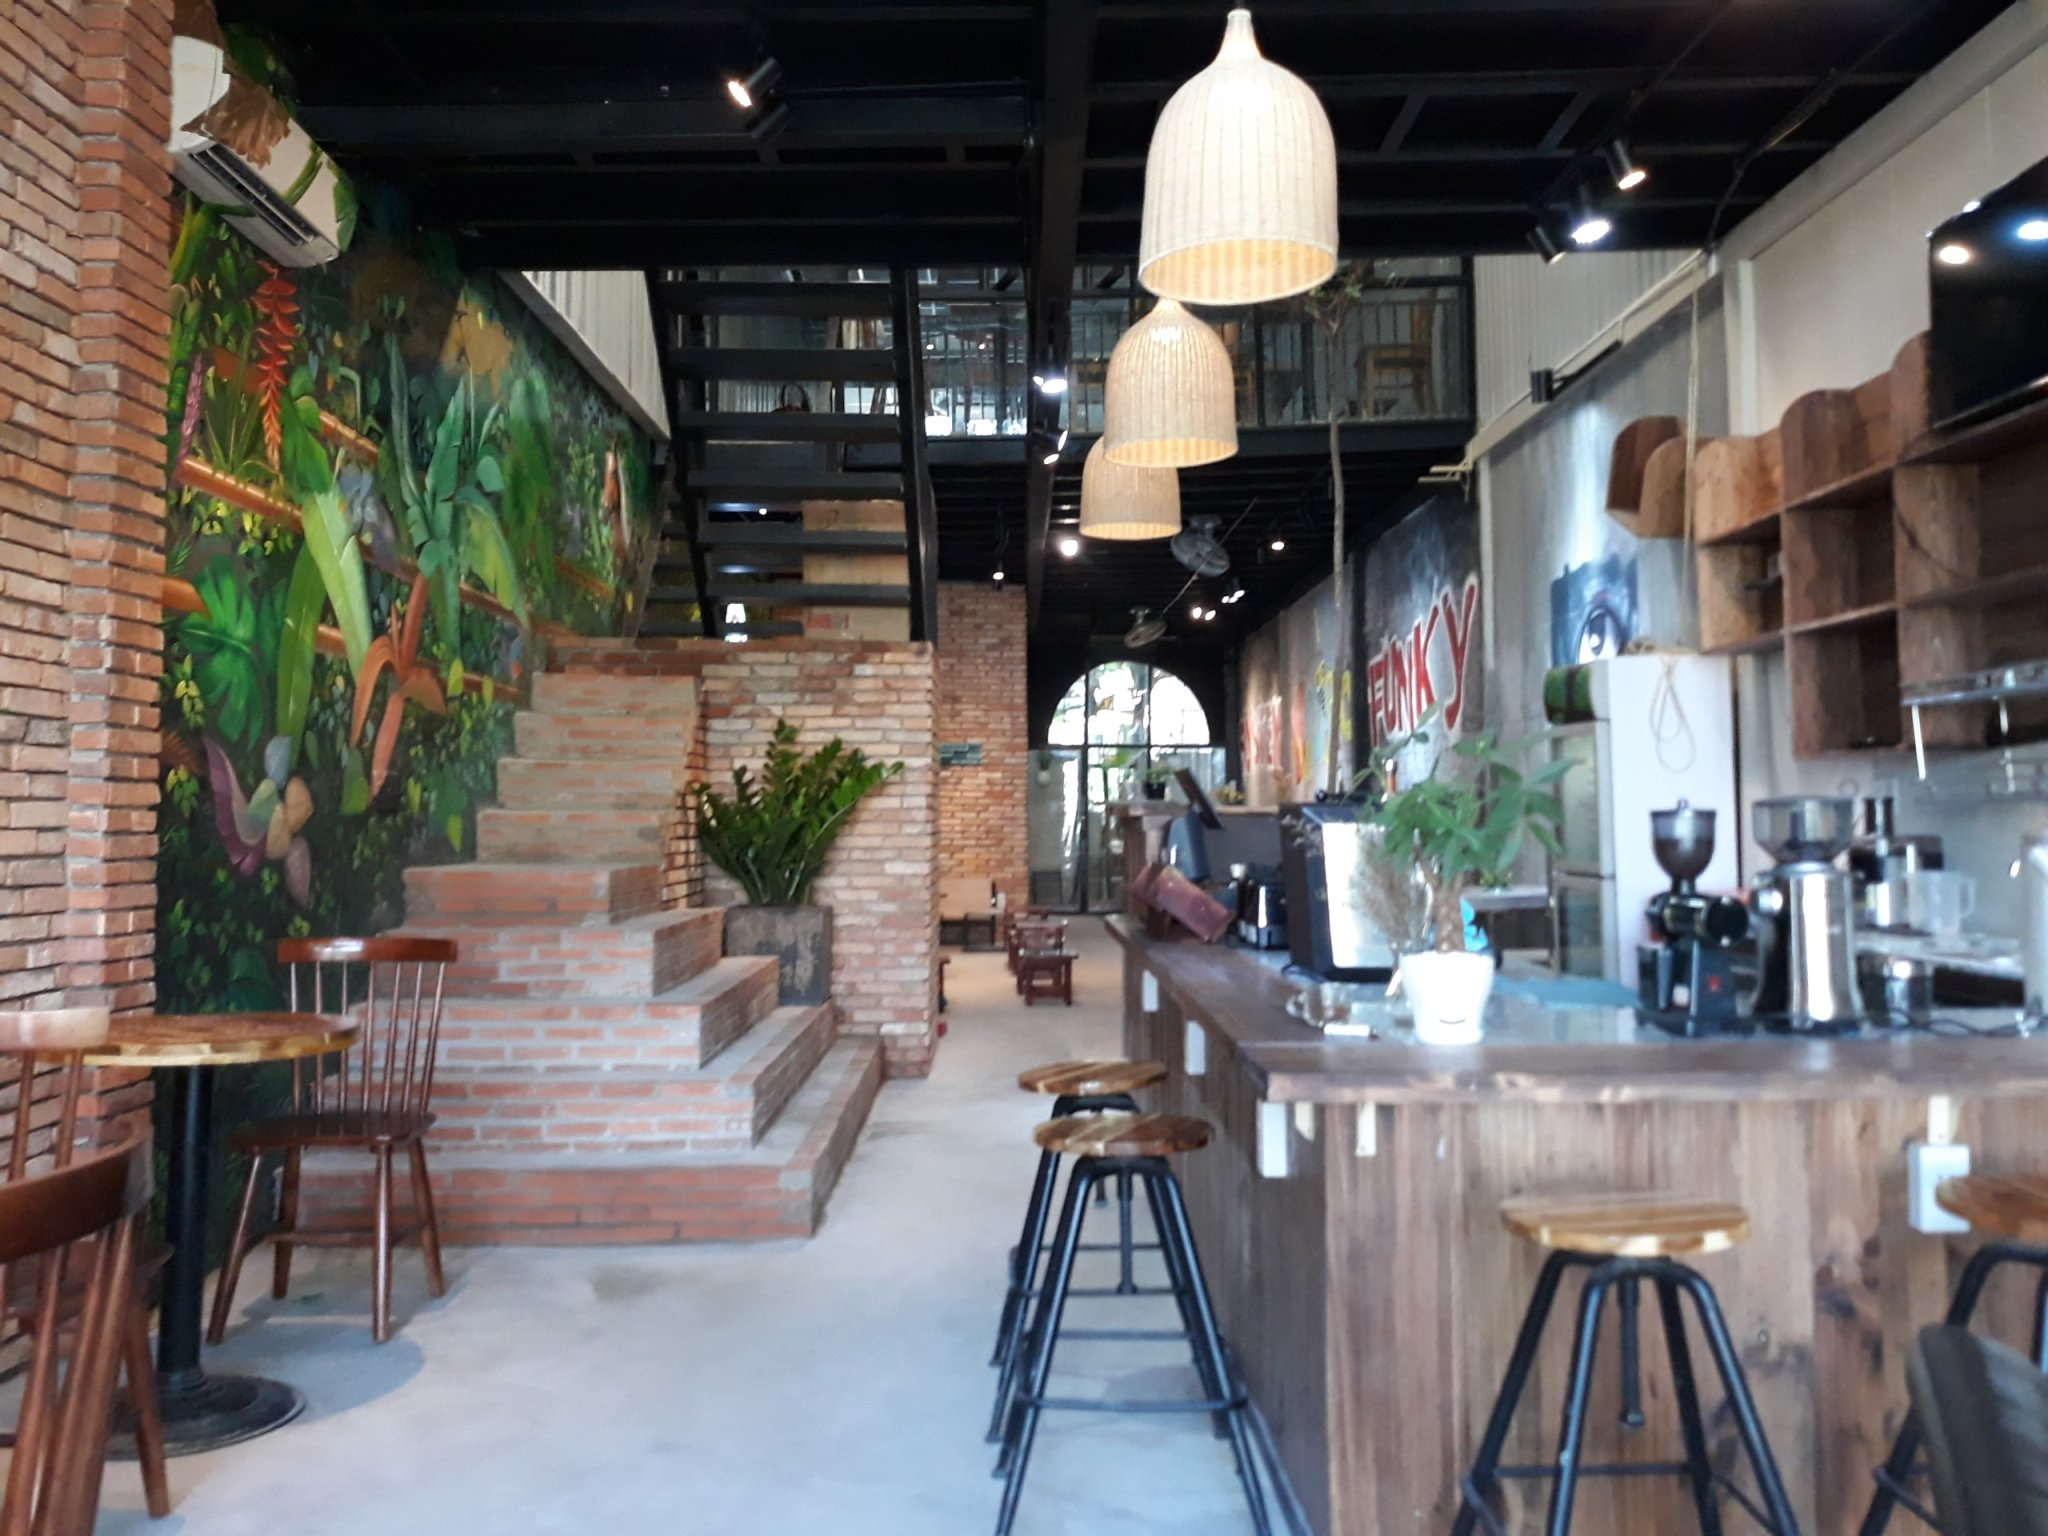 thiet-ke-va-thi-cong-noi-that-quan-cafe